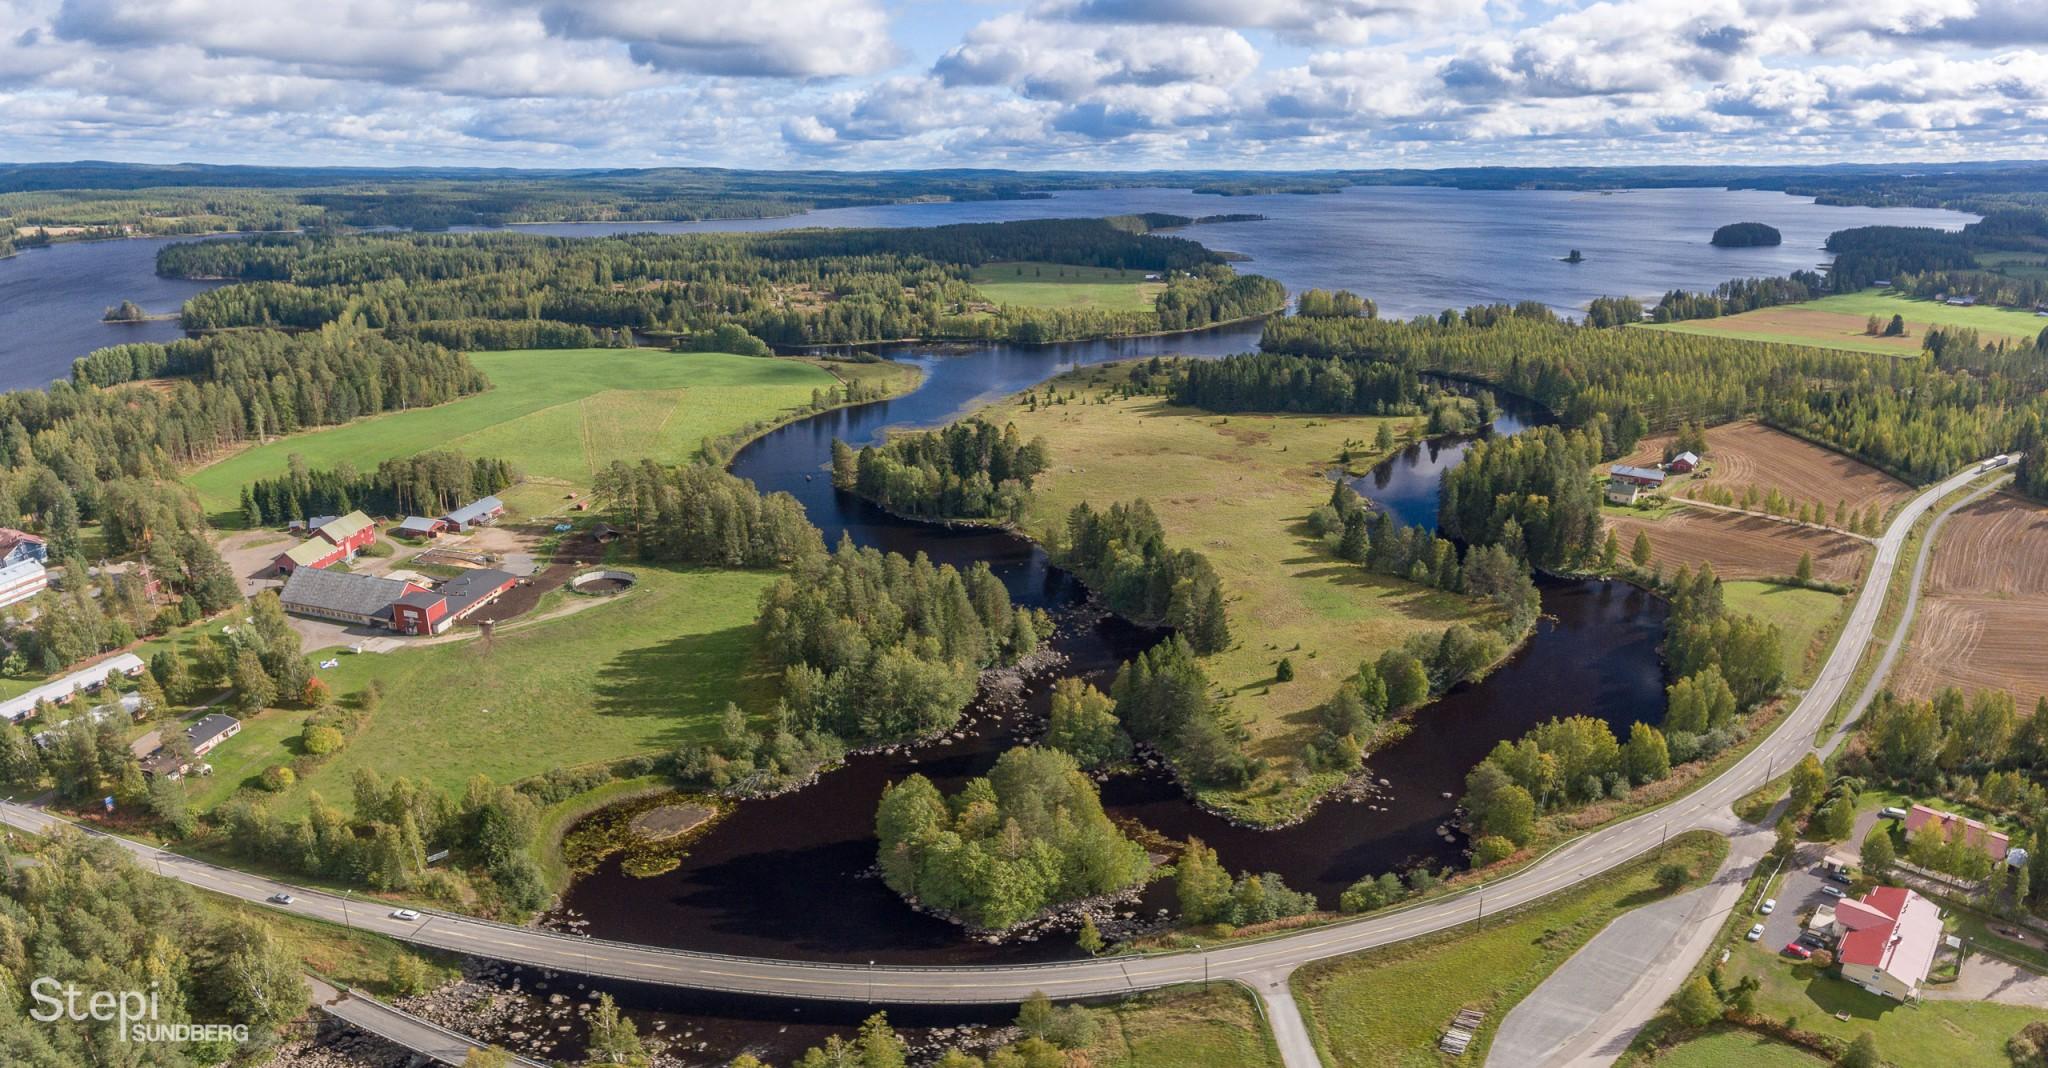 Ilmakuva Tarvaala, Valokuvaaja Stepi Sundberg